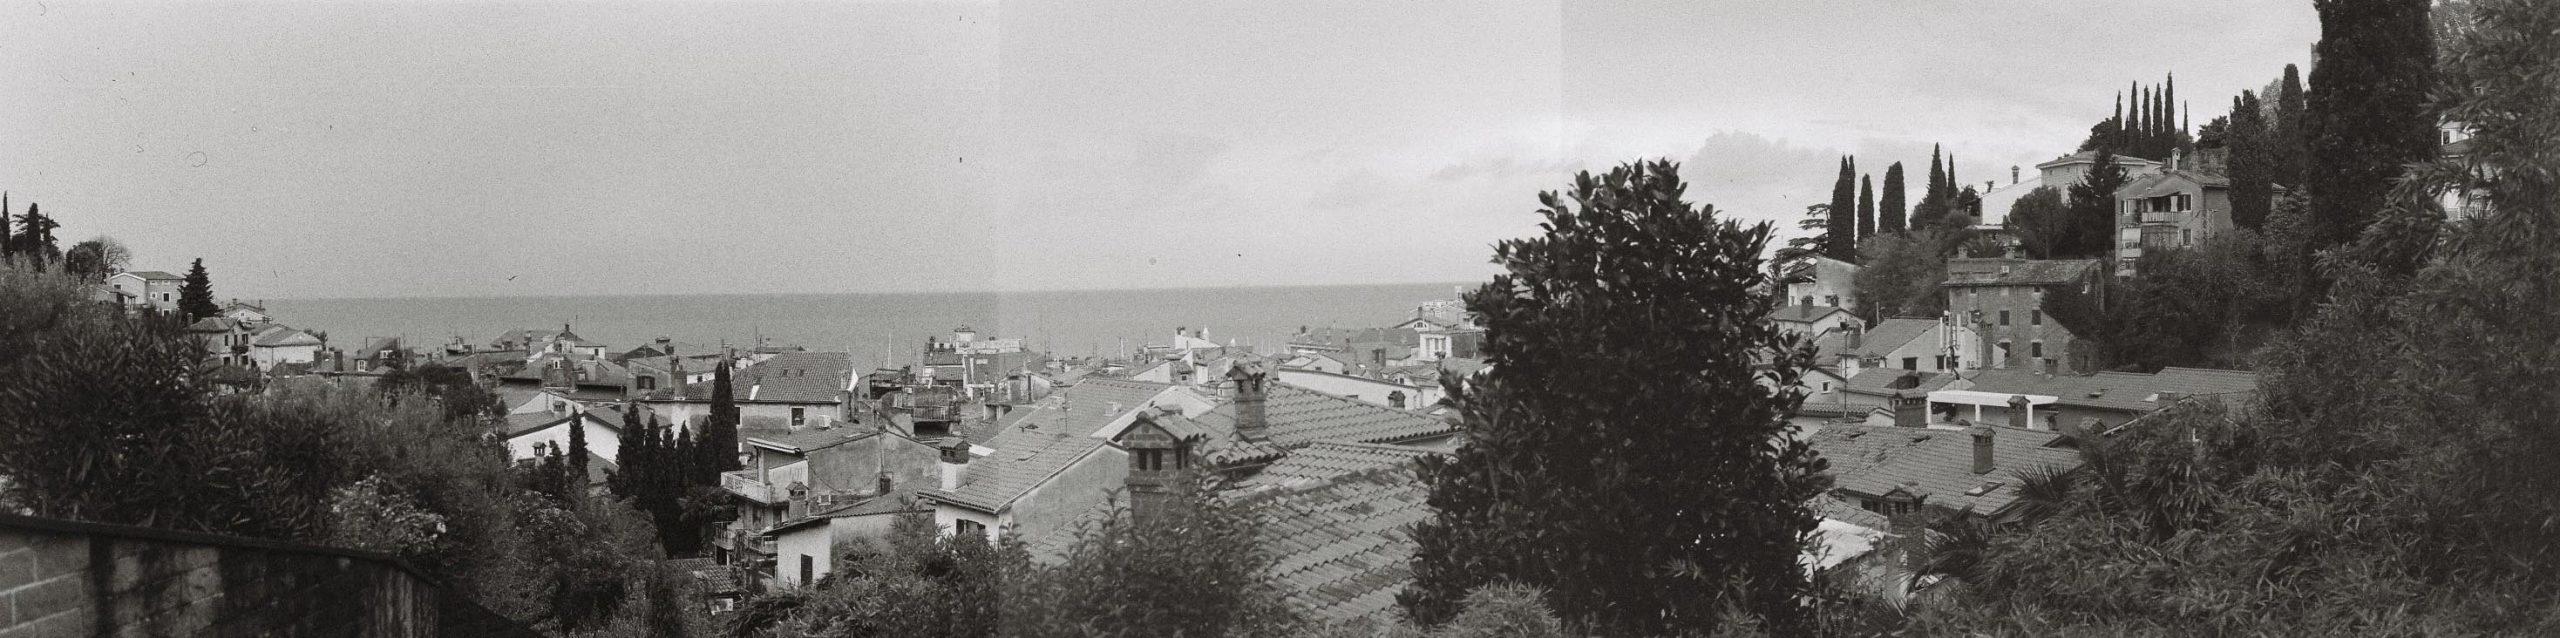 2019 Panorama Piran View Adria